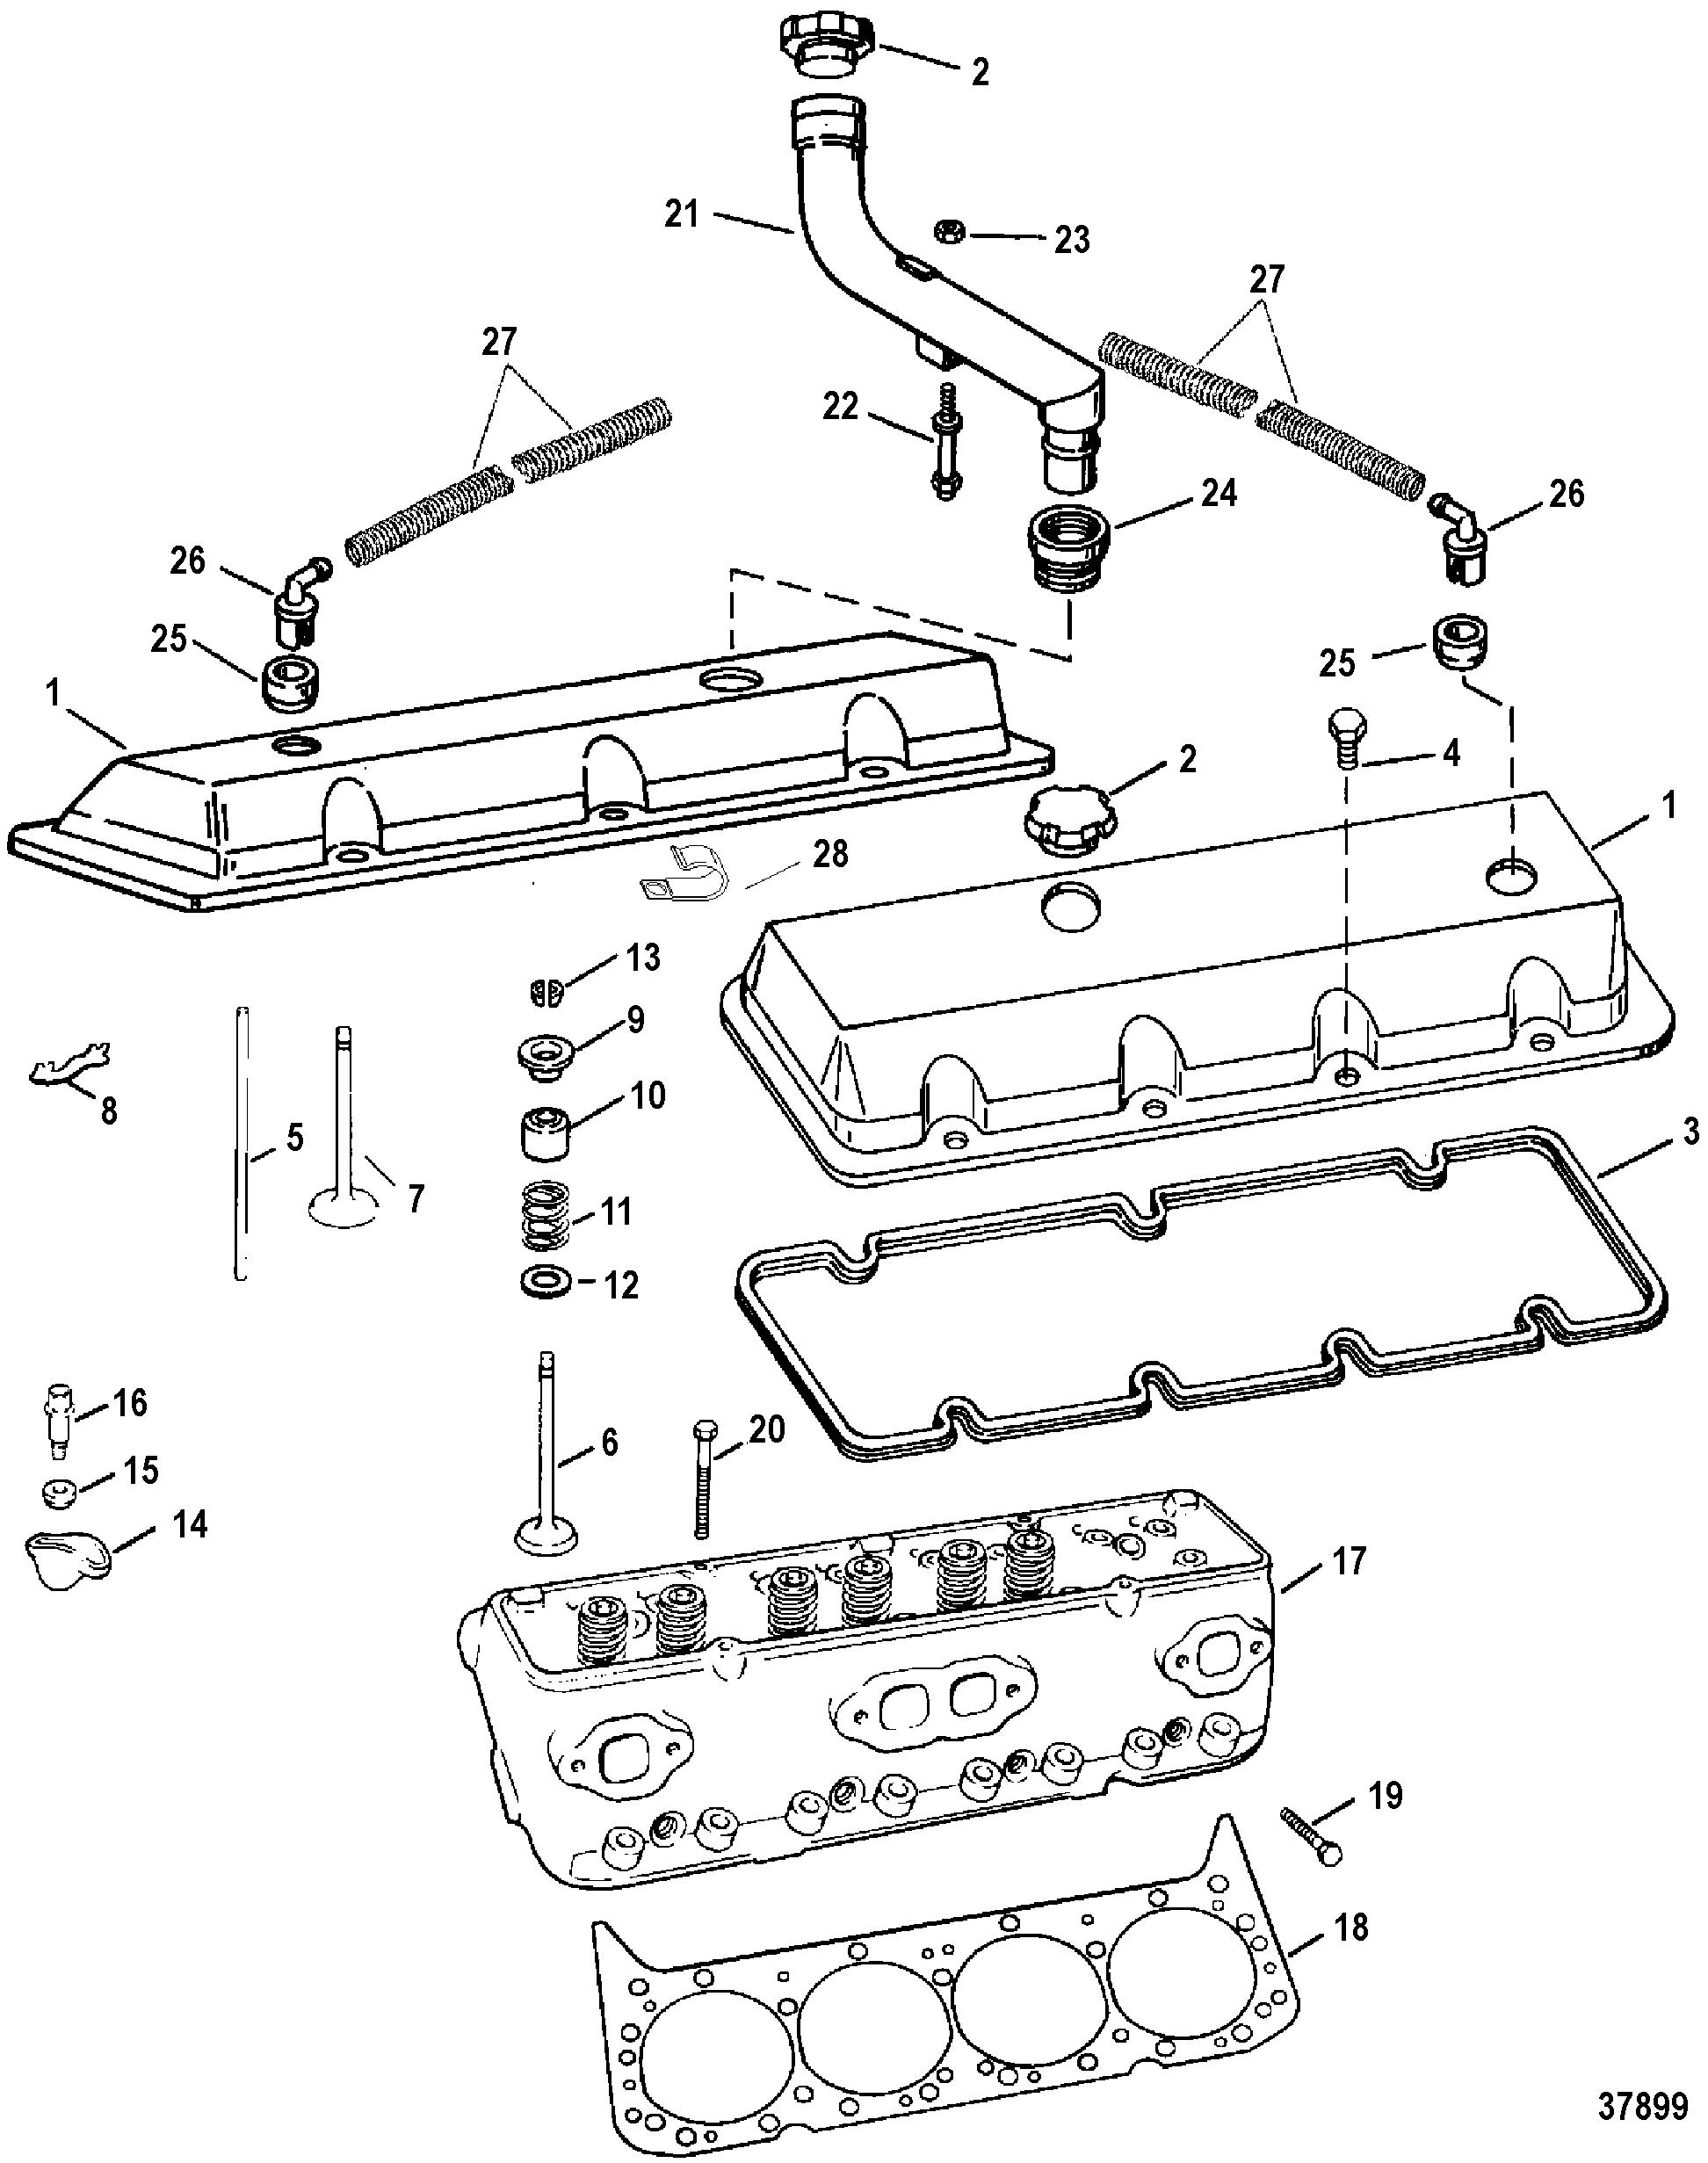 Hardin Marine - Cylinder Head And Rocker Cover (454 Magnum)Hardin Marine